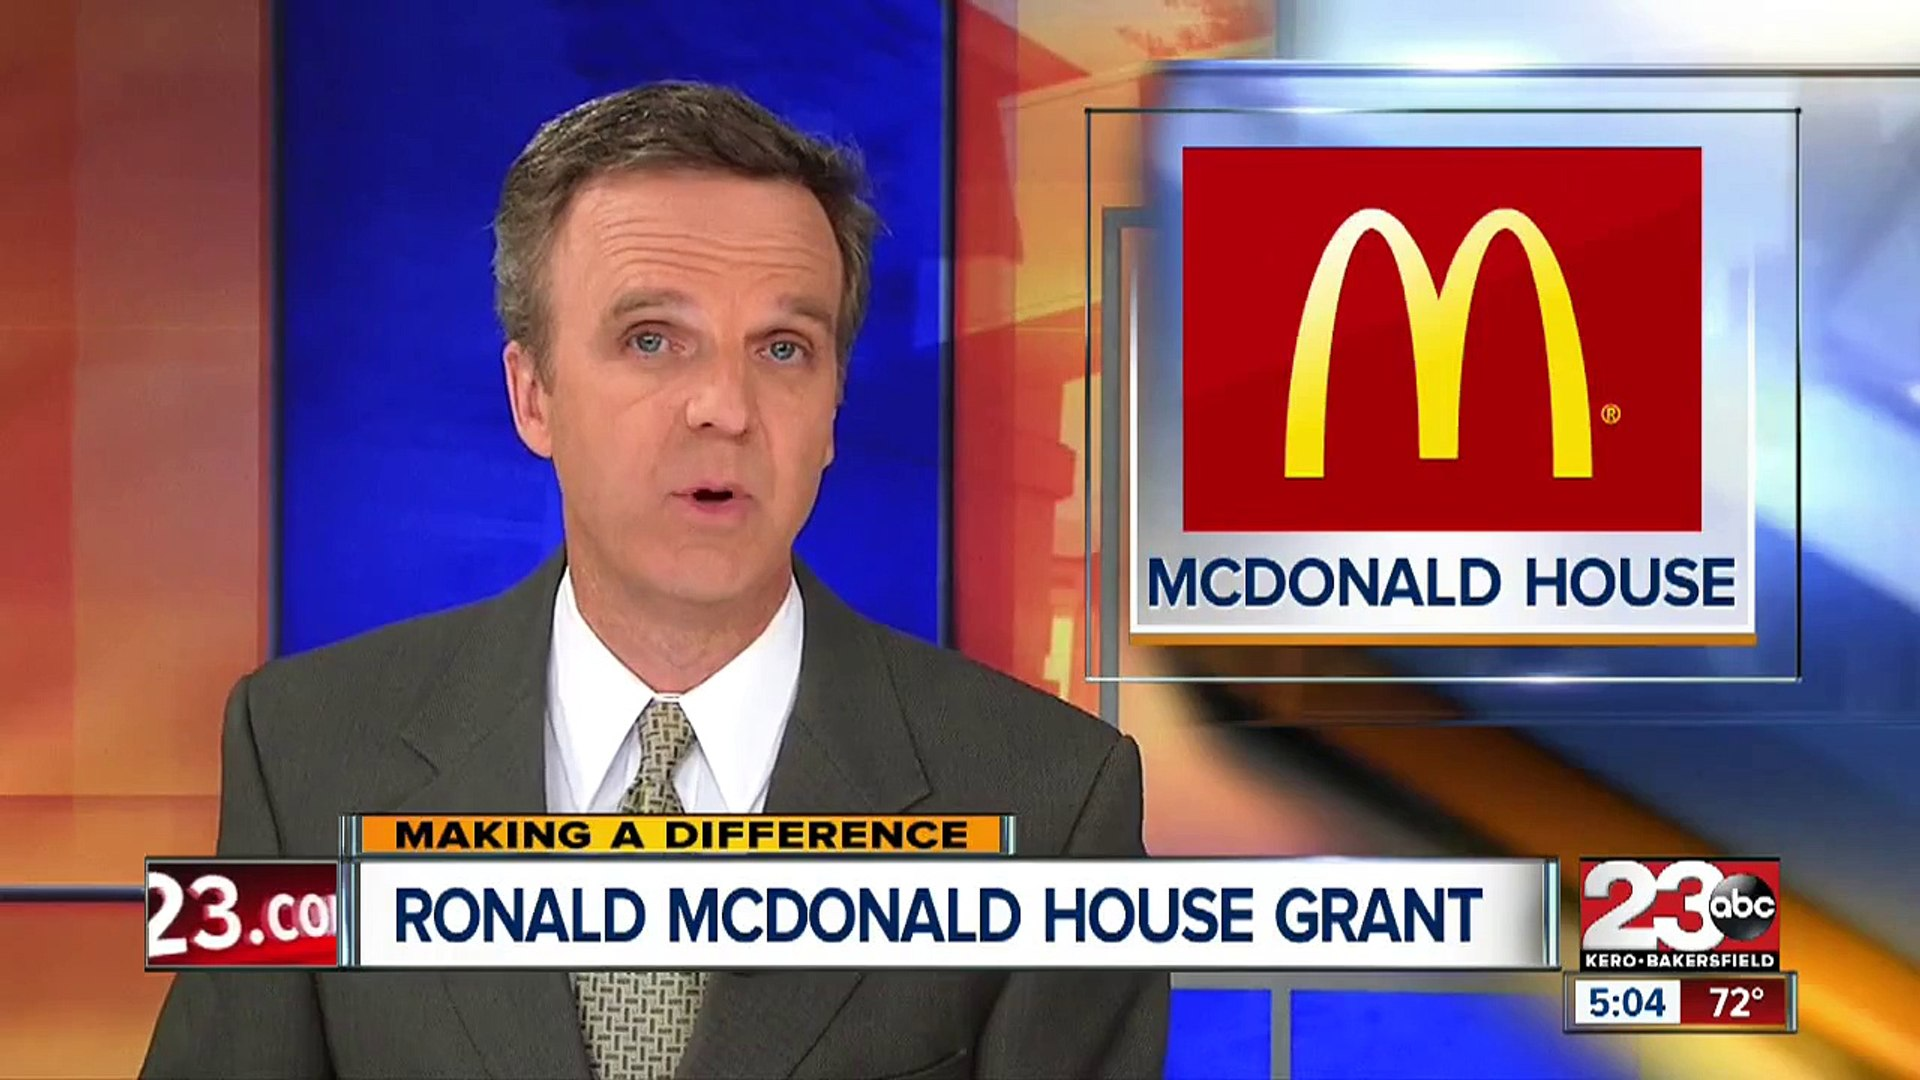 Ronald McDonald House gives grants to several local non-profits